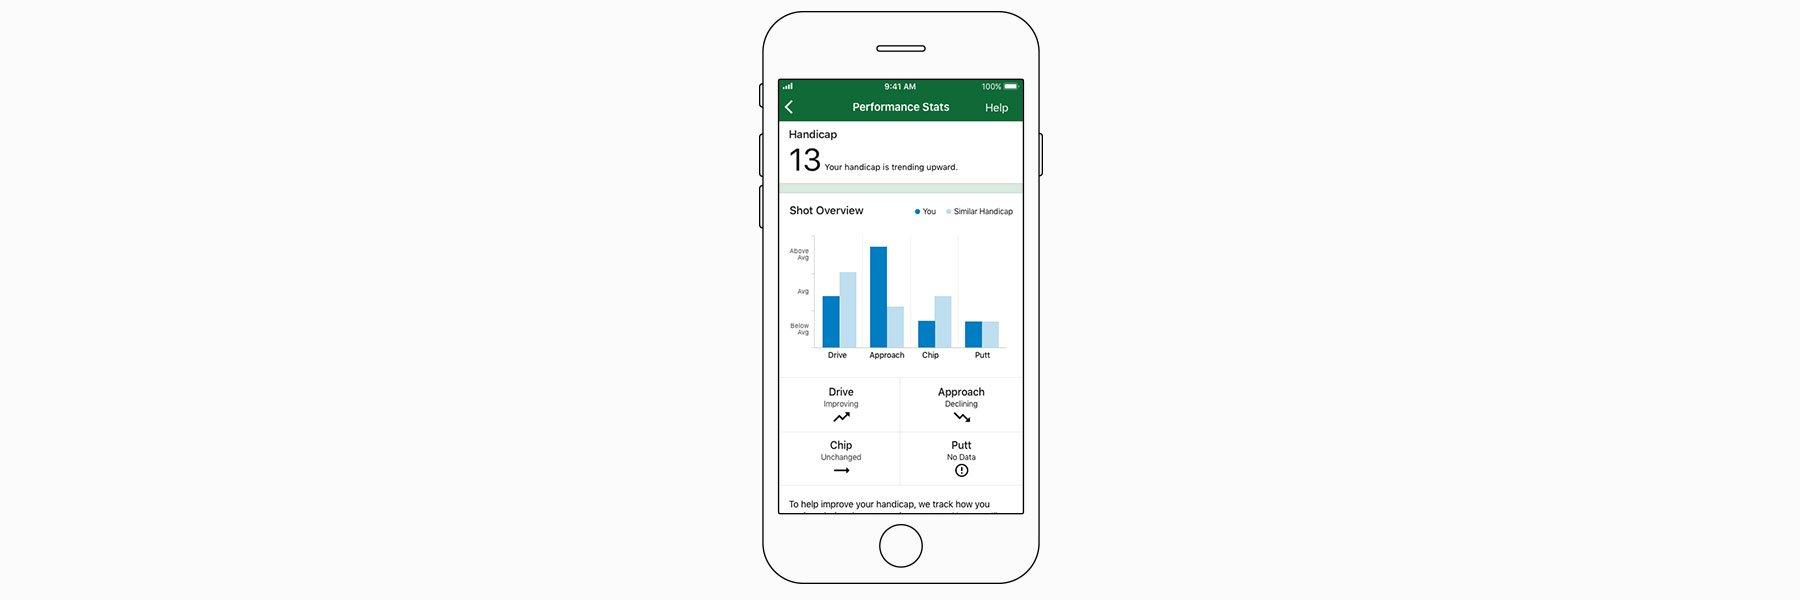 Strokes gained - Garmin Golf™ App